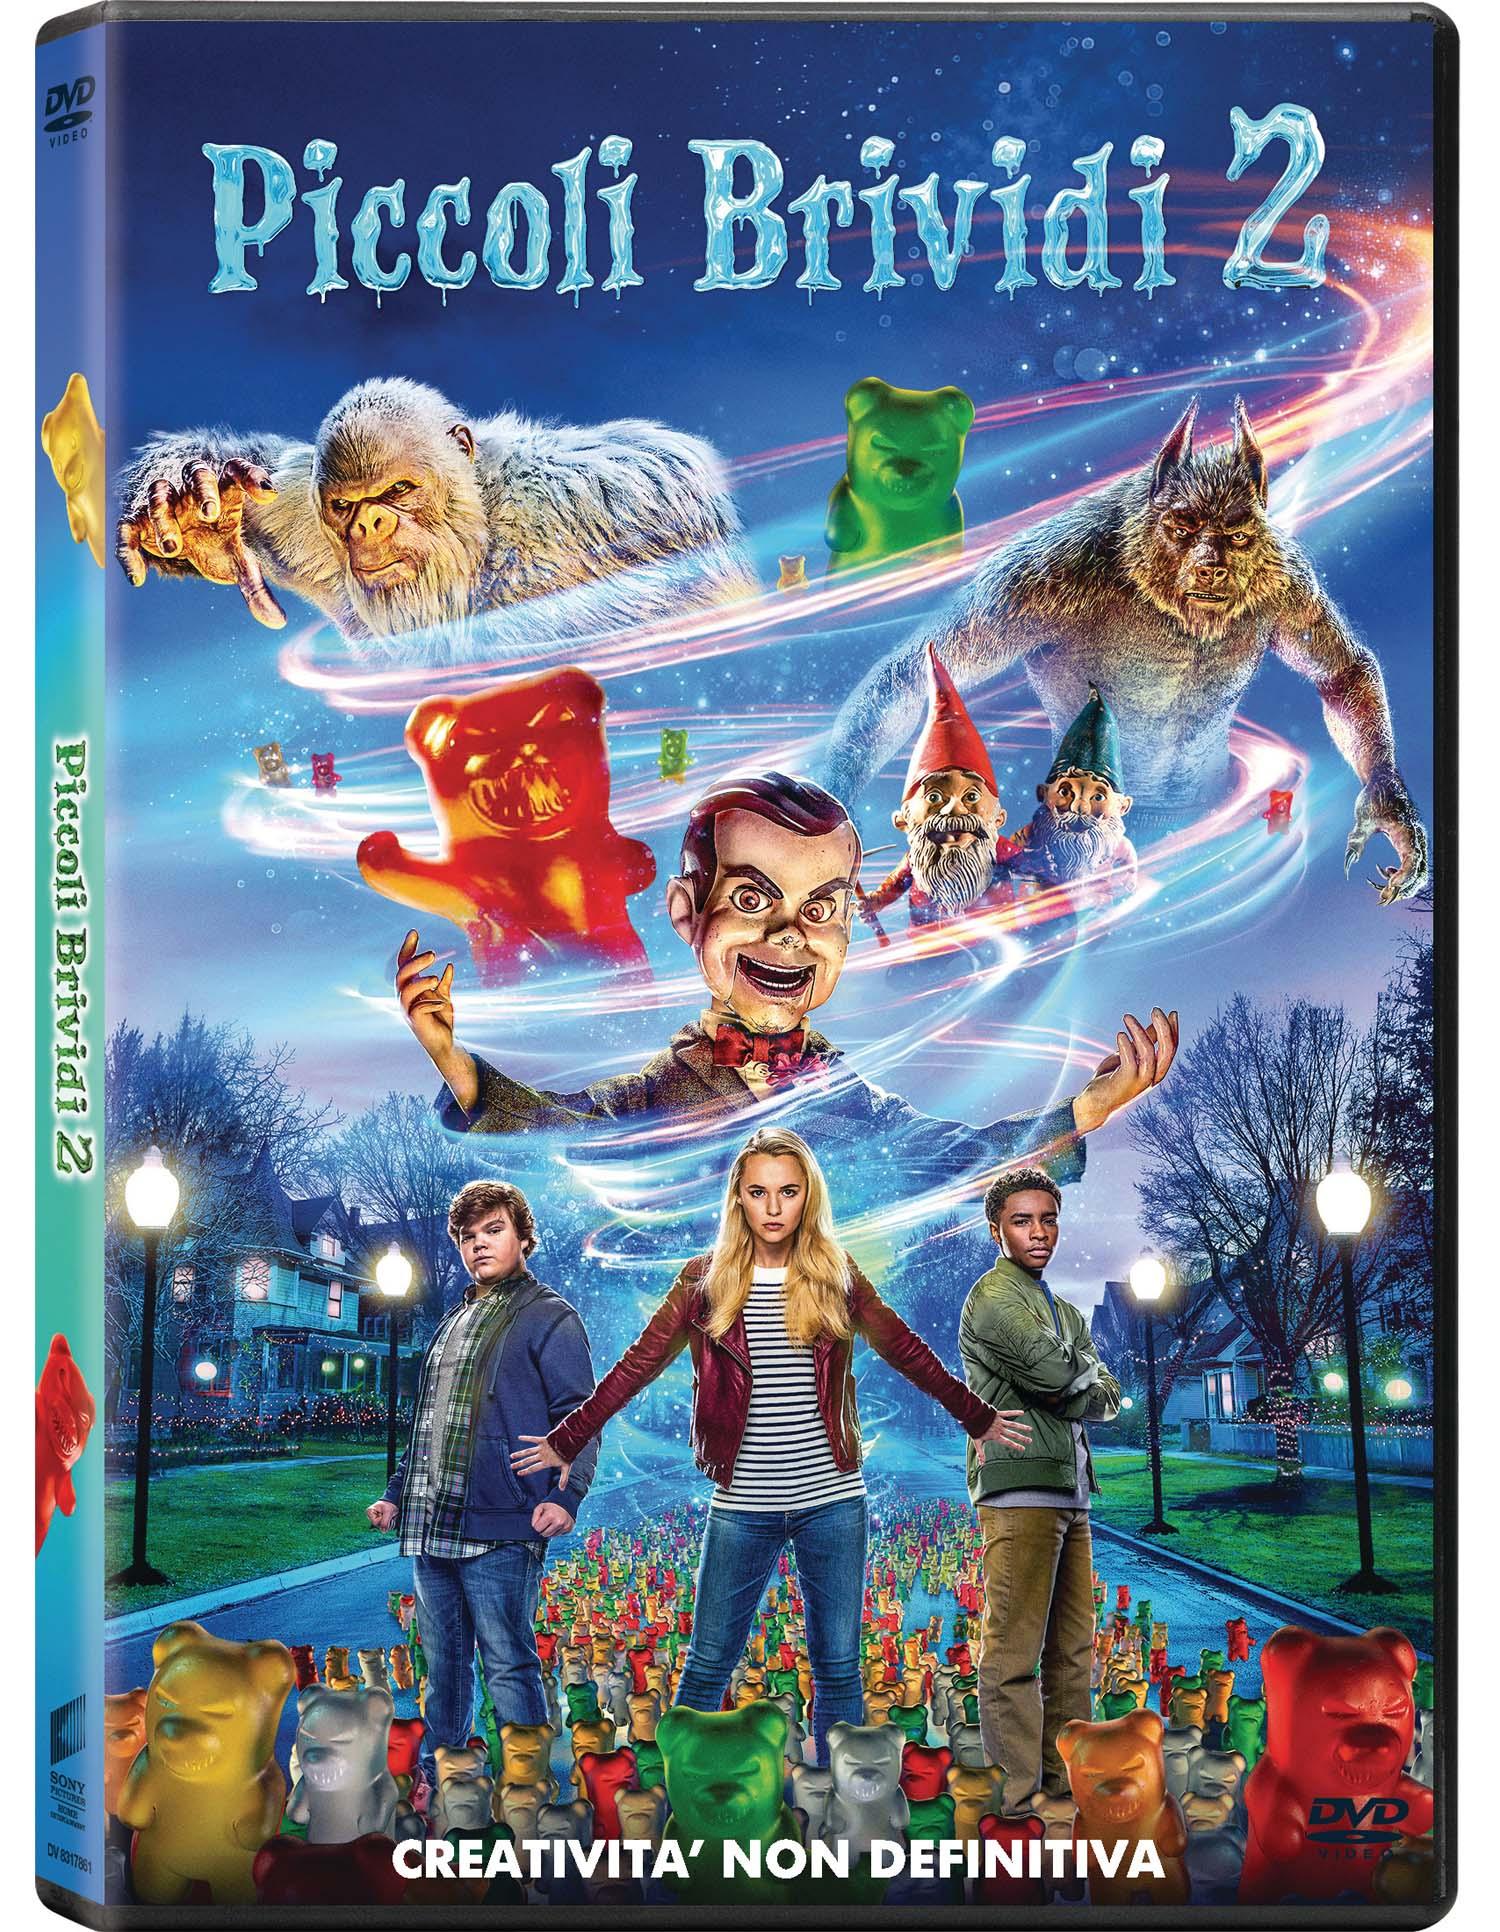 PICCOLI BRIVIDI 2: I FANTASMI DI HALLOWEEN (DVD)